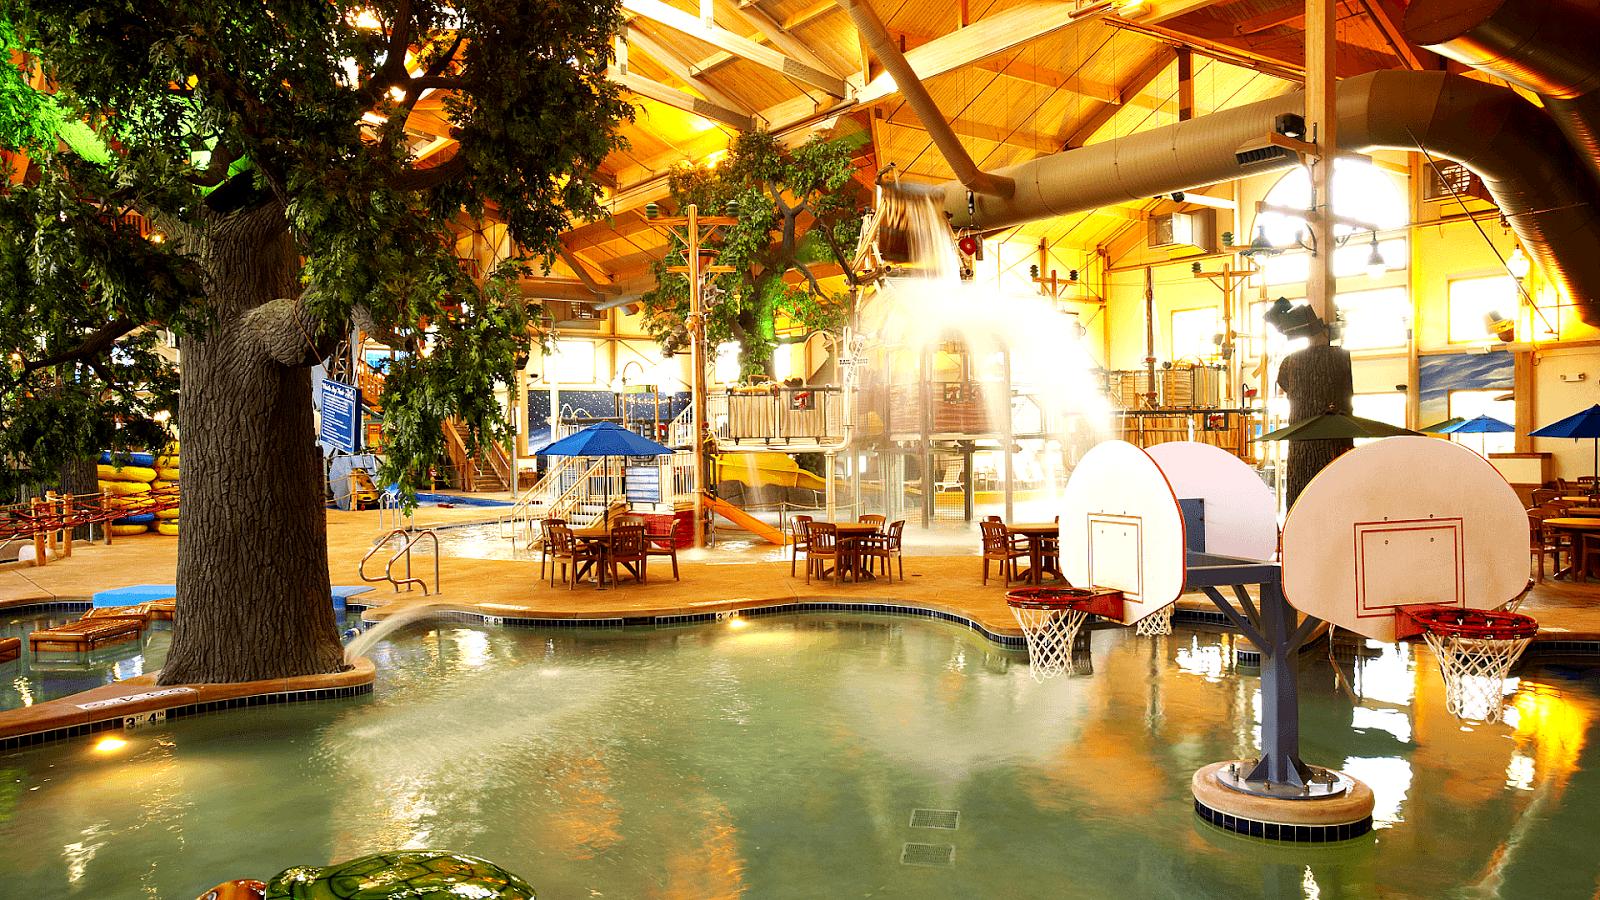 Adventureland Indoor Water Park Trip To Park